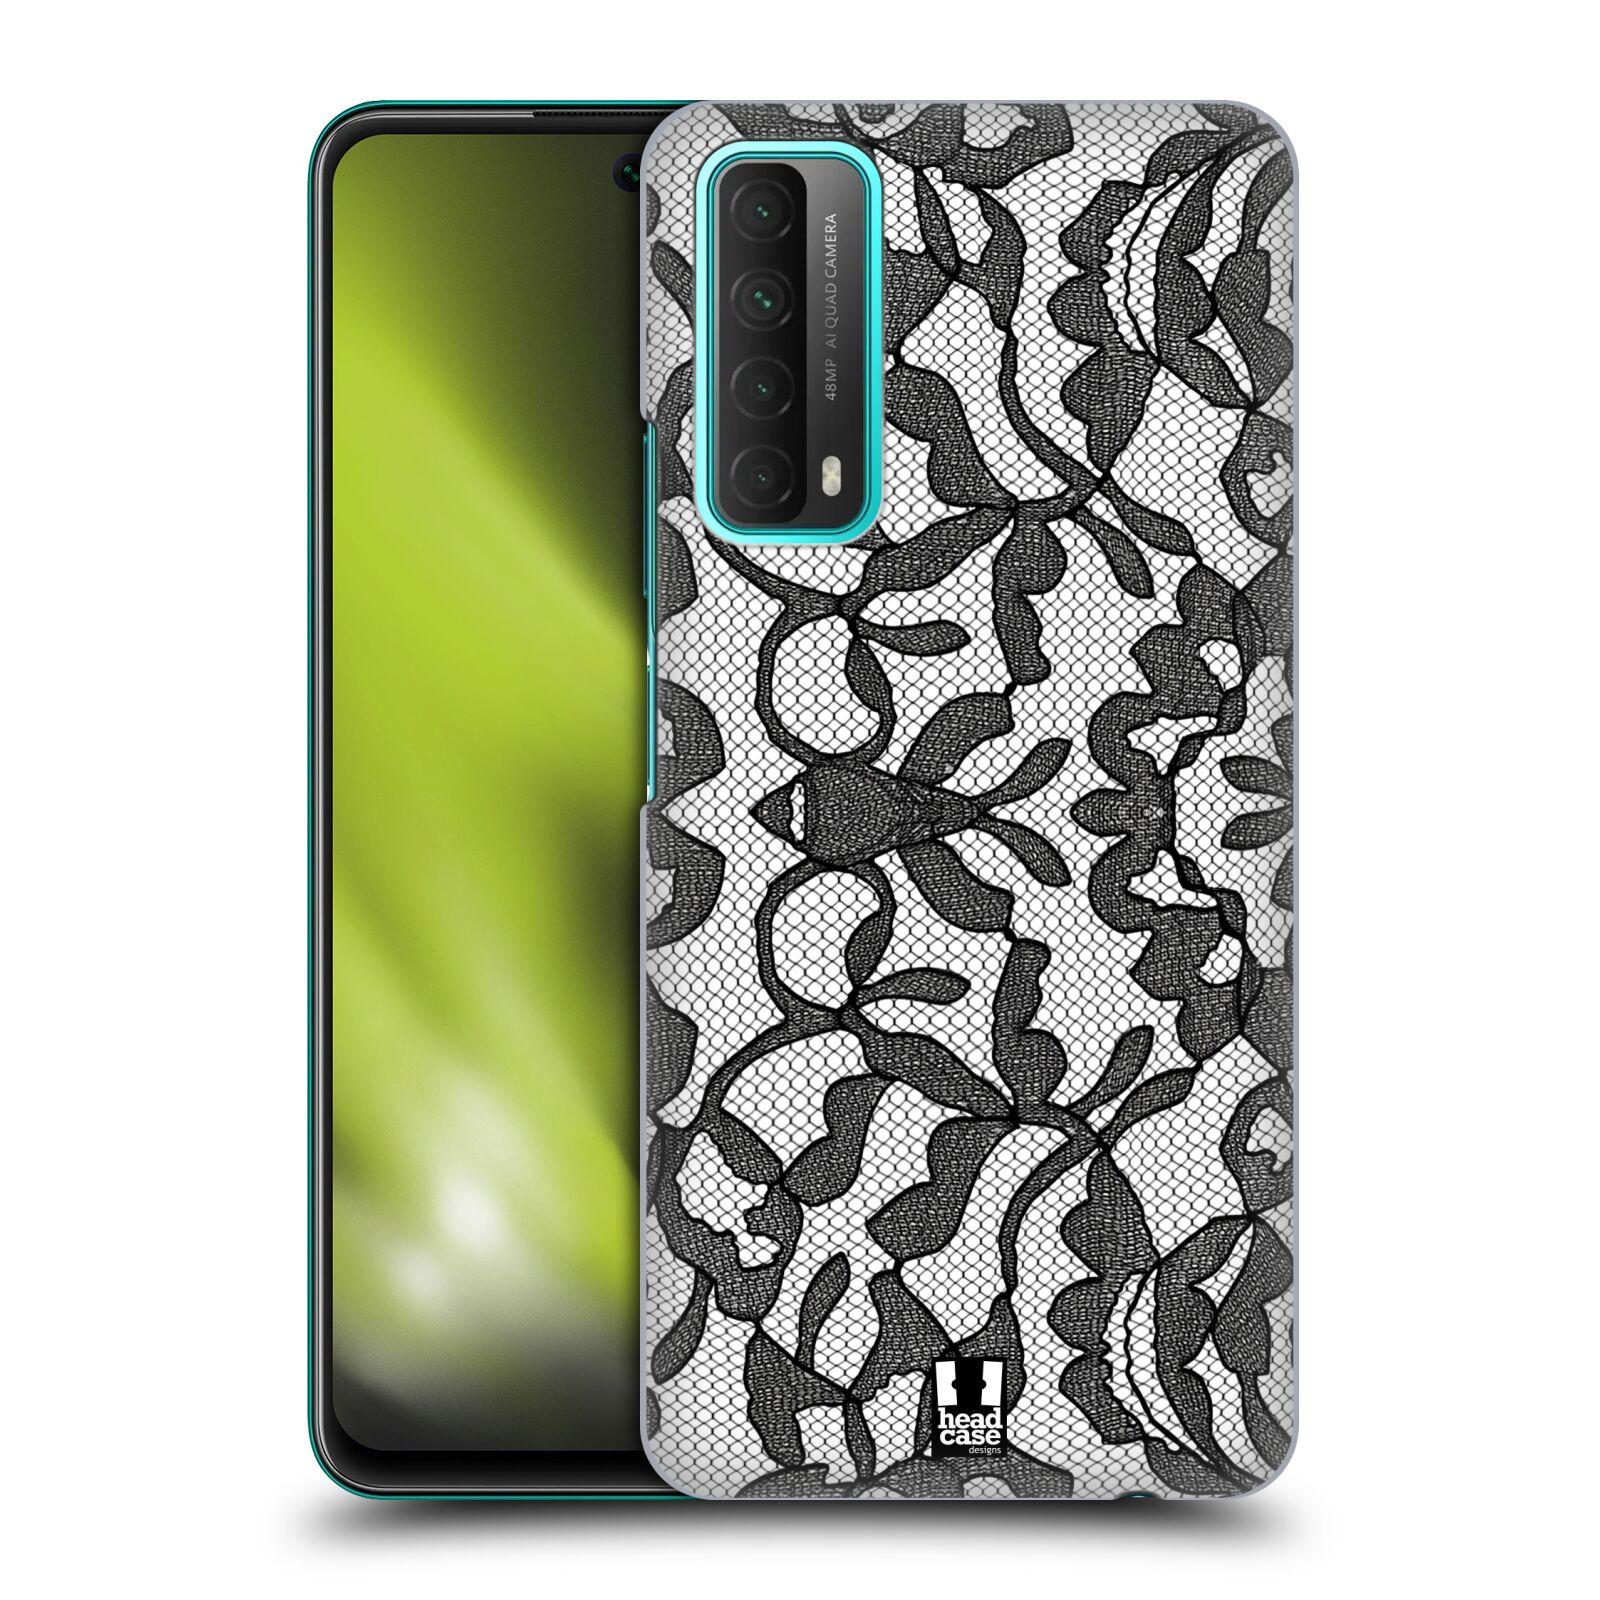 Plastové pouzdro na mobil Huawei P Smart (2021) - Head Case - LEAFY KRAJKA